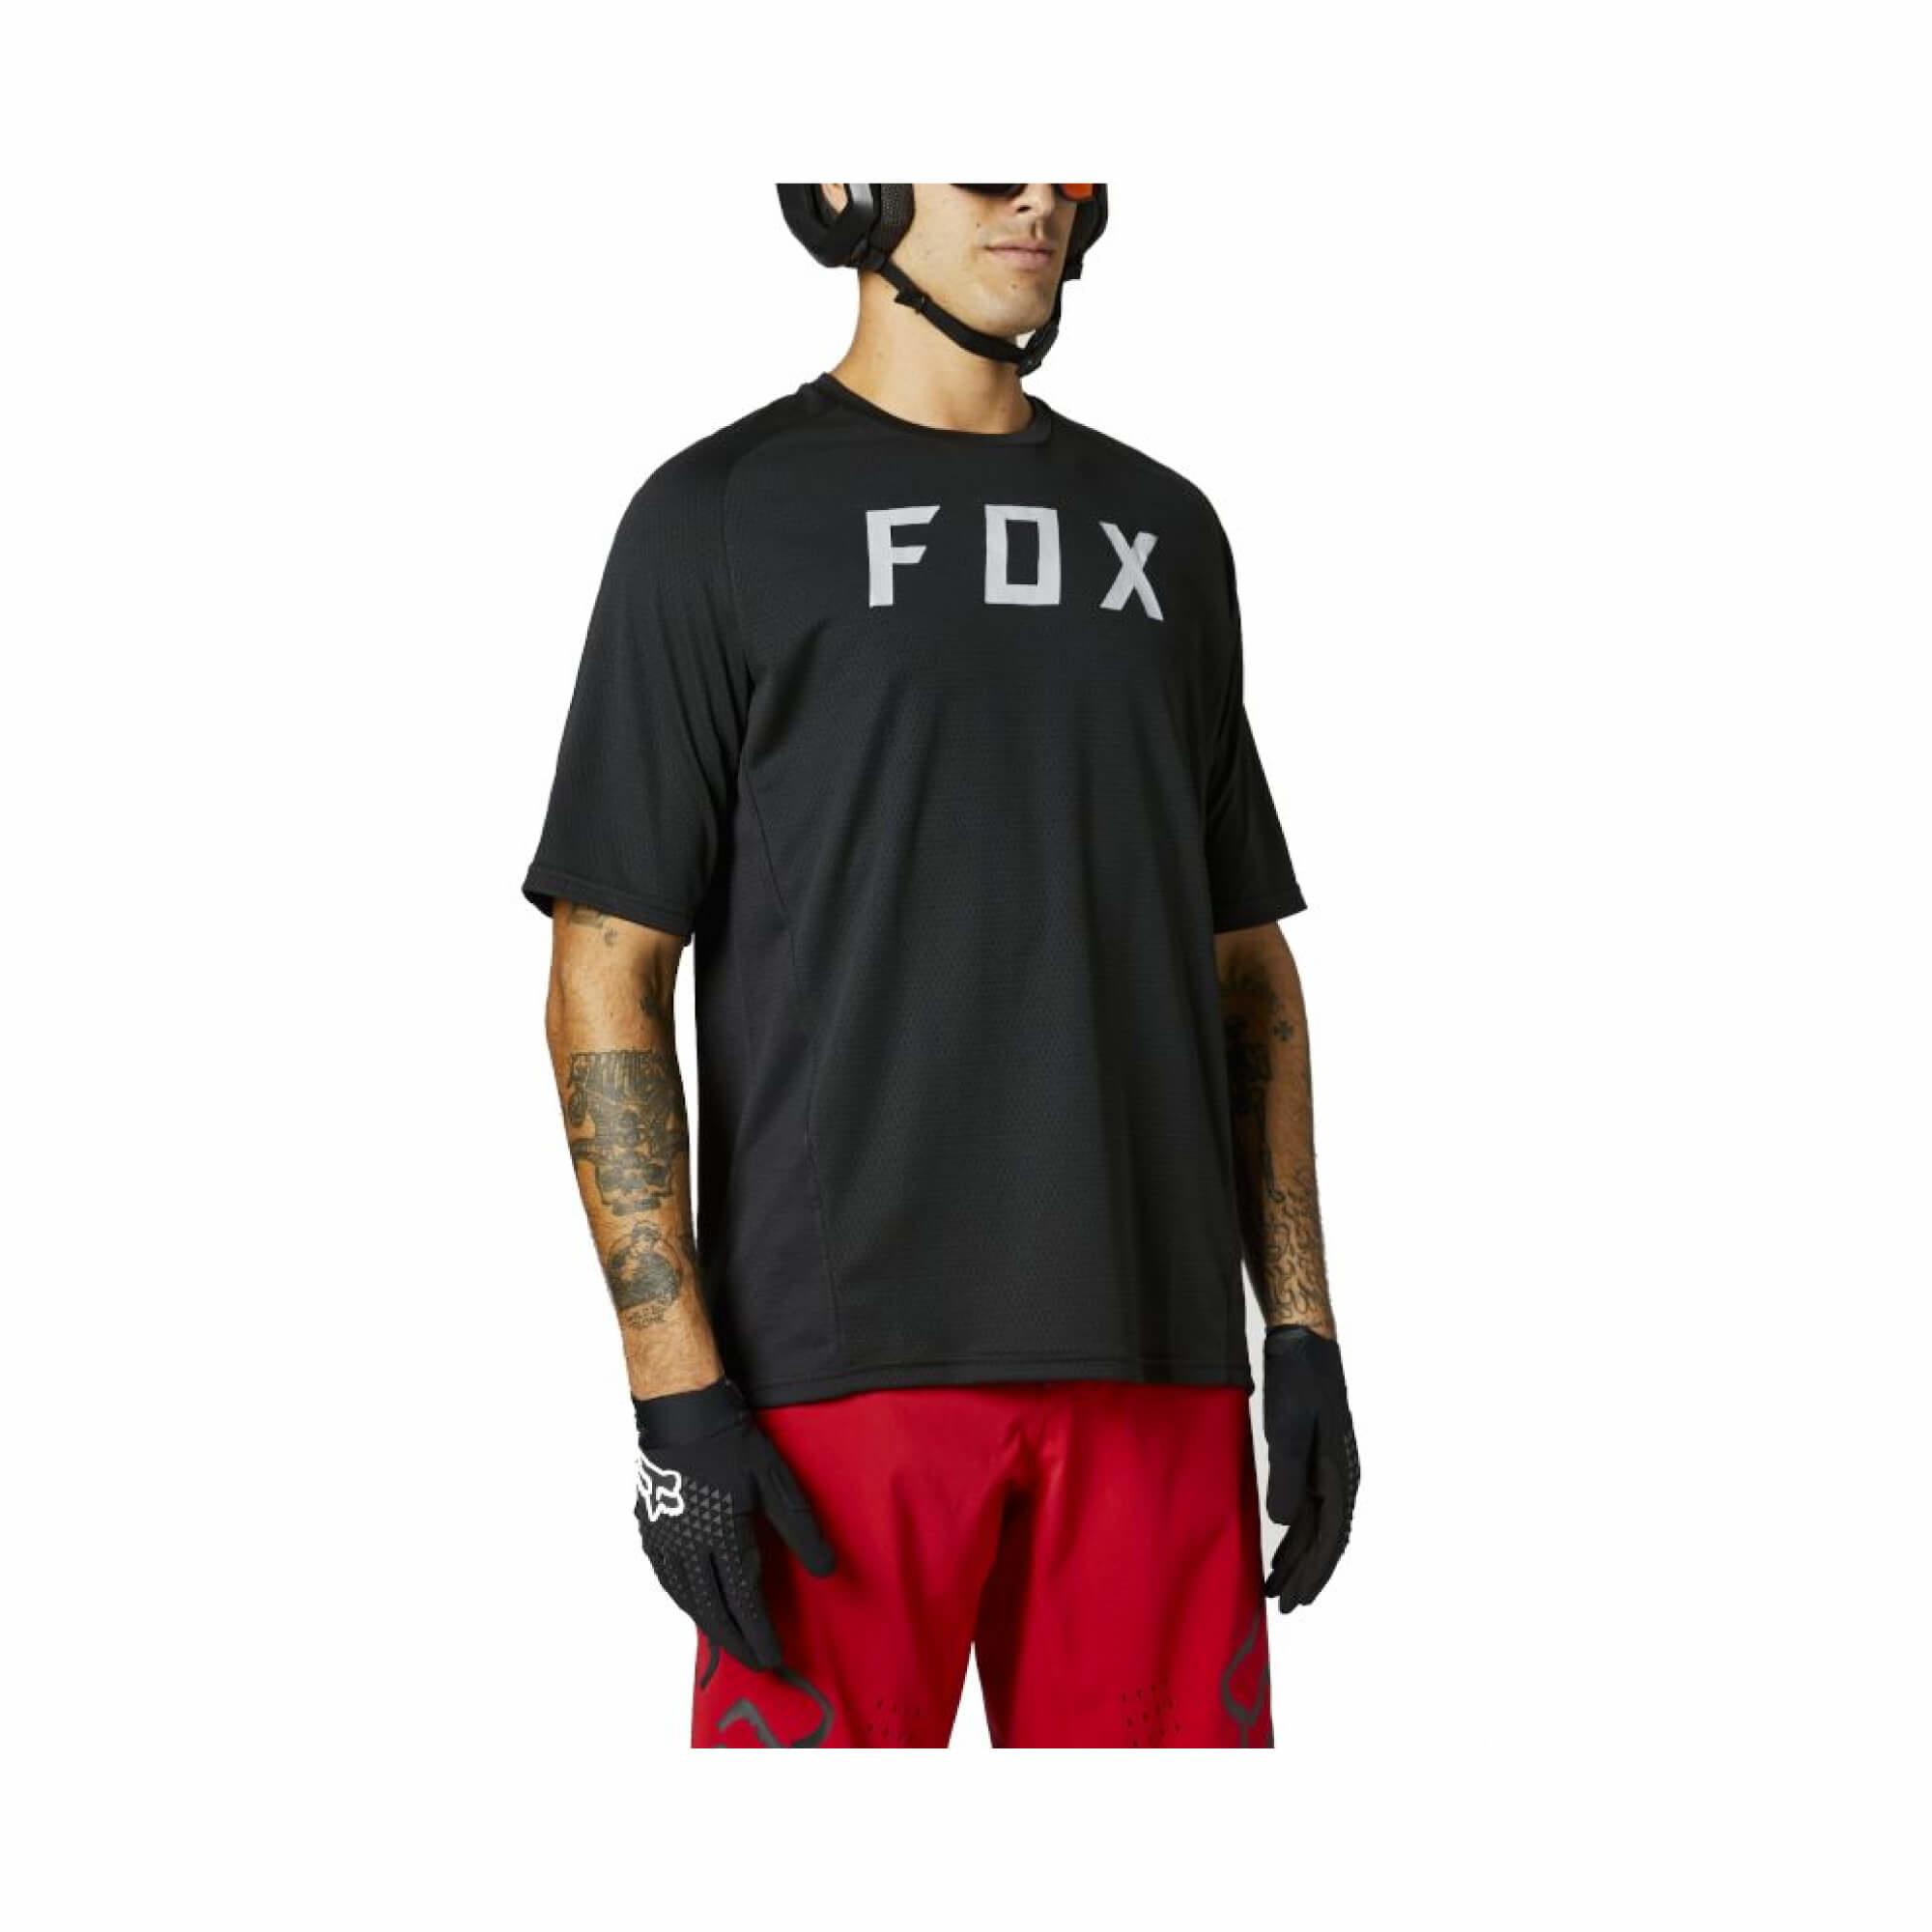 Defend Short Sleeve Jersey Fox 2021-2